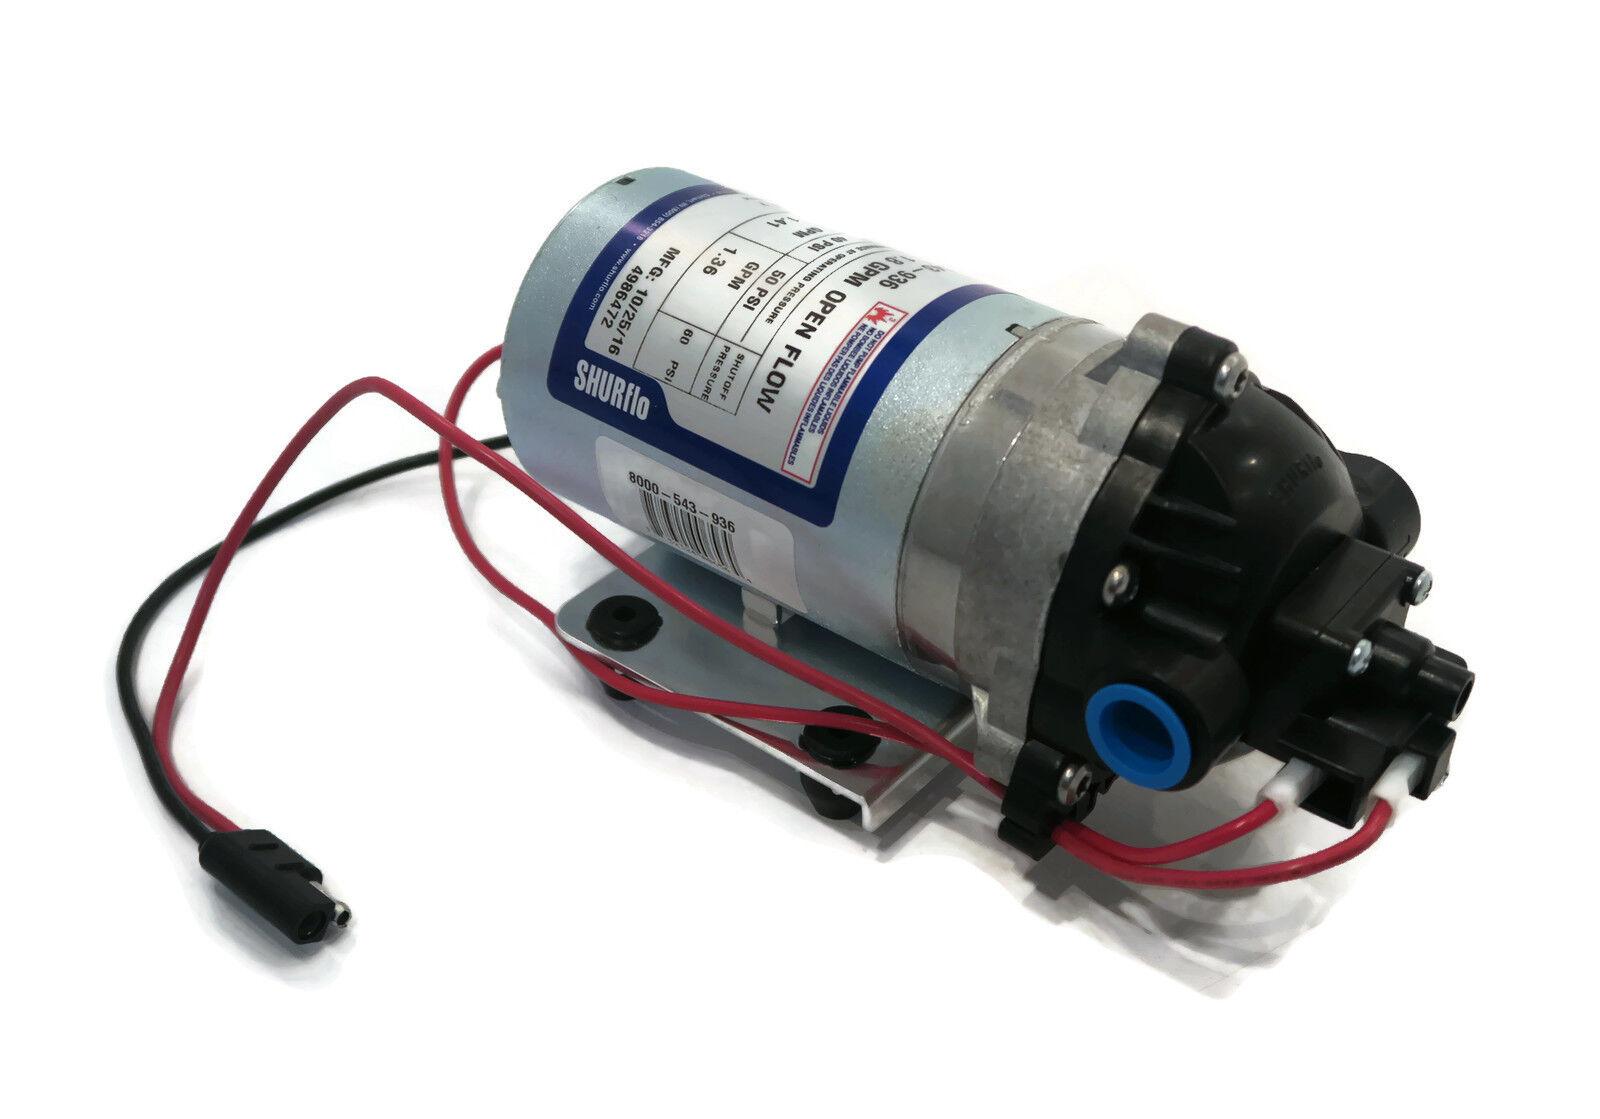 Harness Wiring 12v For Sprayer 30 Diagram Images Atv 57set Id880000500f Shurflo Volt Demand Water Pump W Lawn